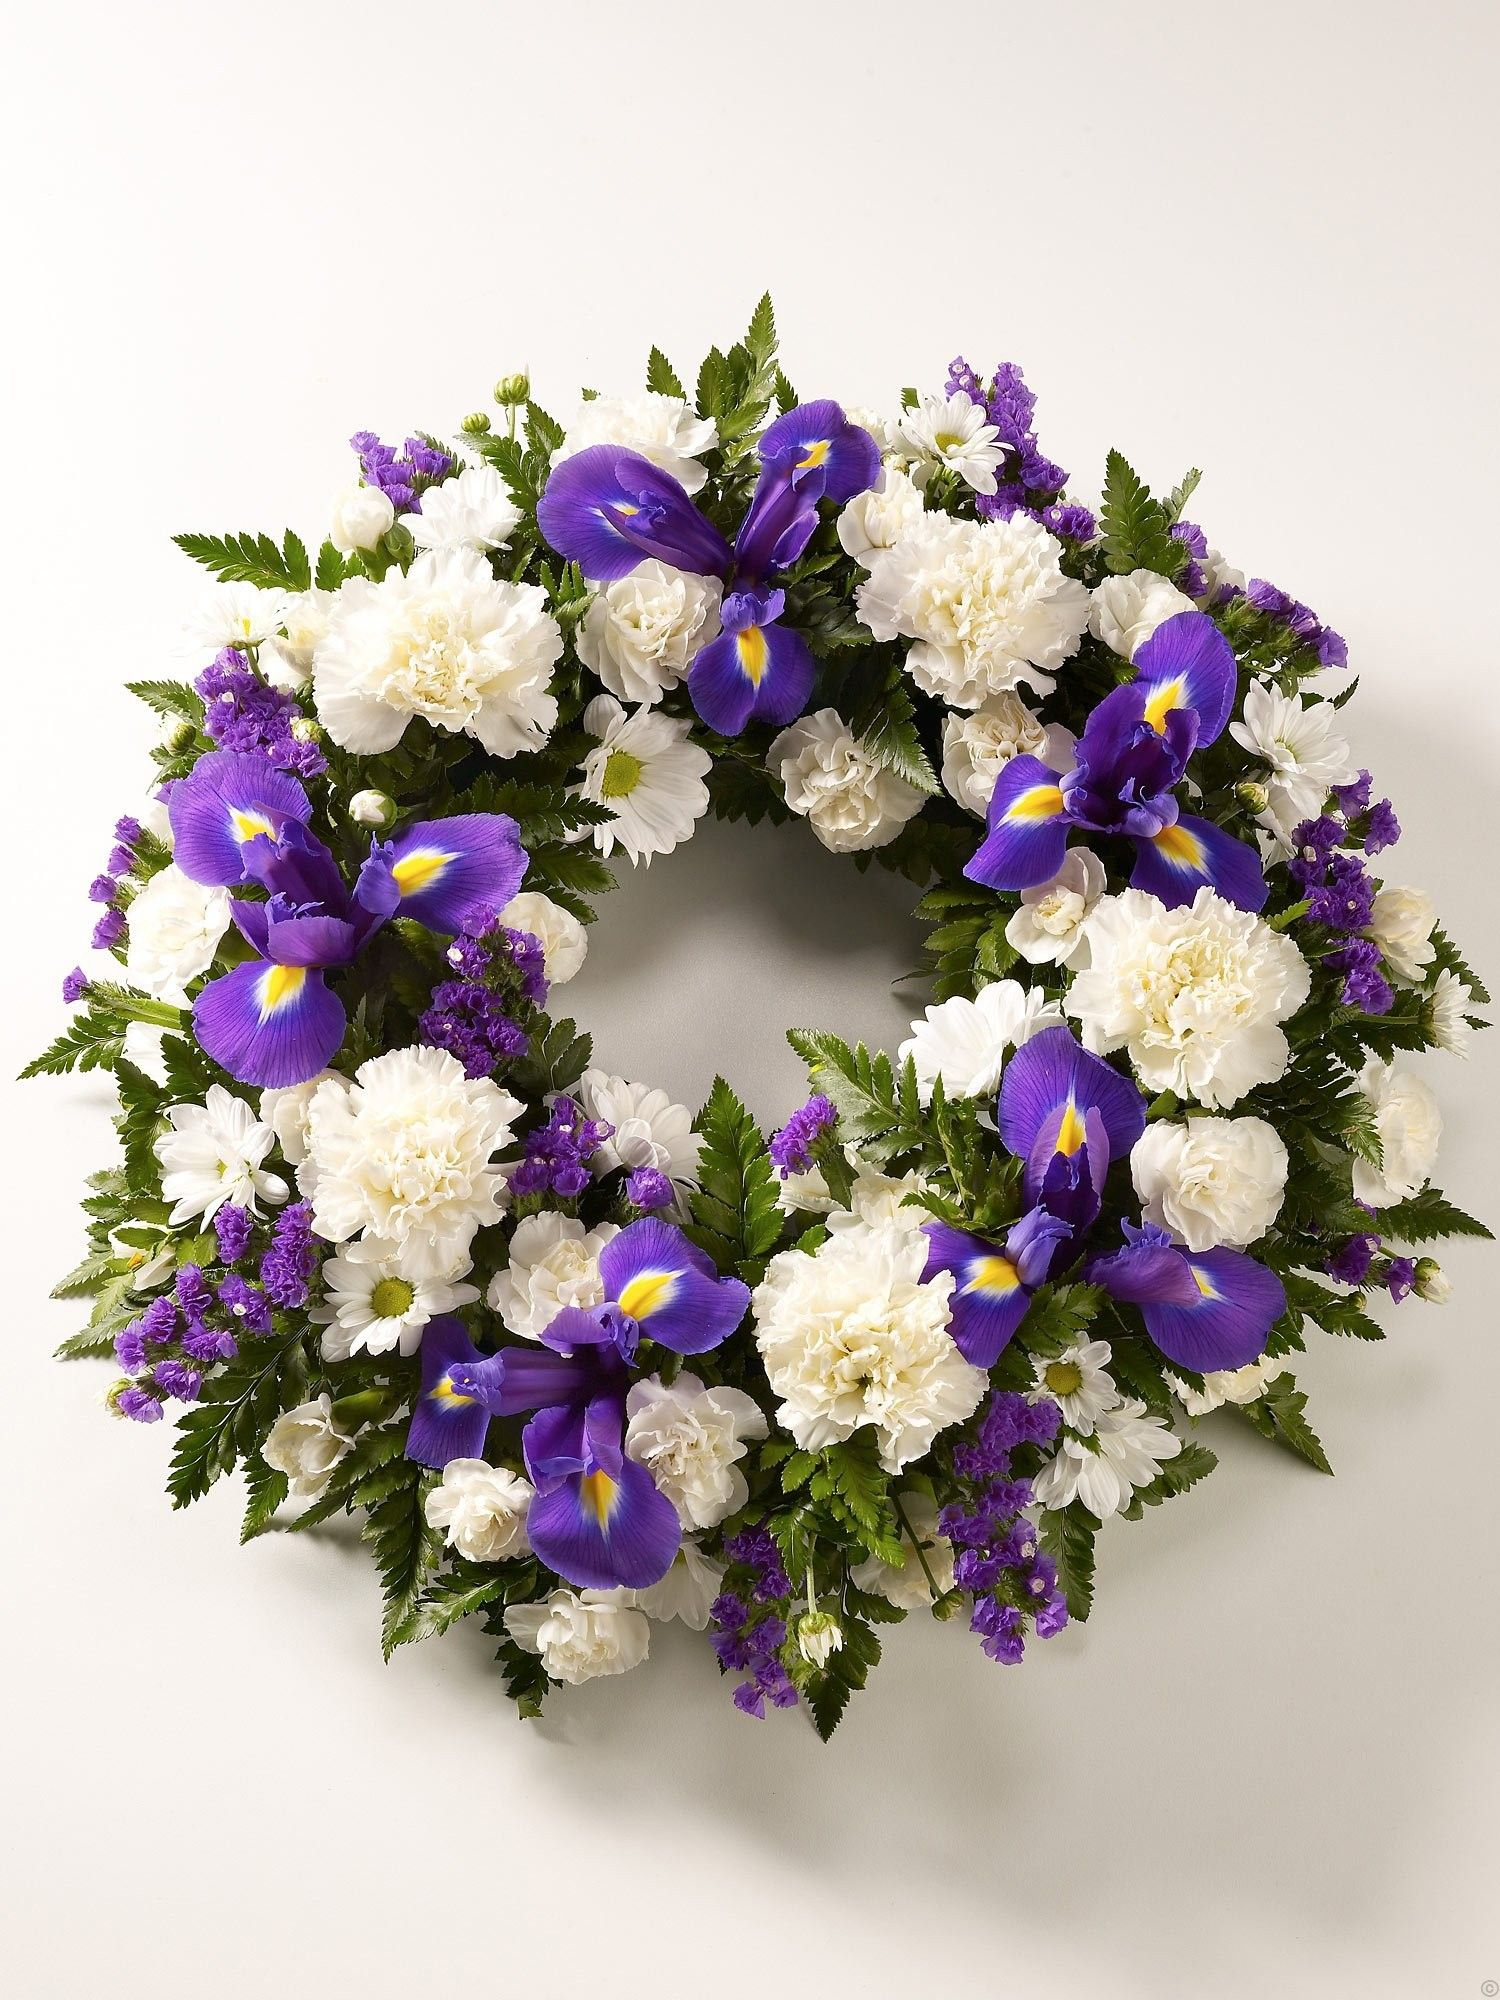 Image result for funeral arrangement flowers blue iris